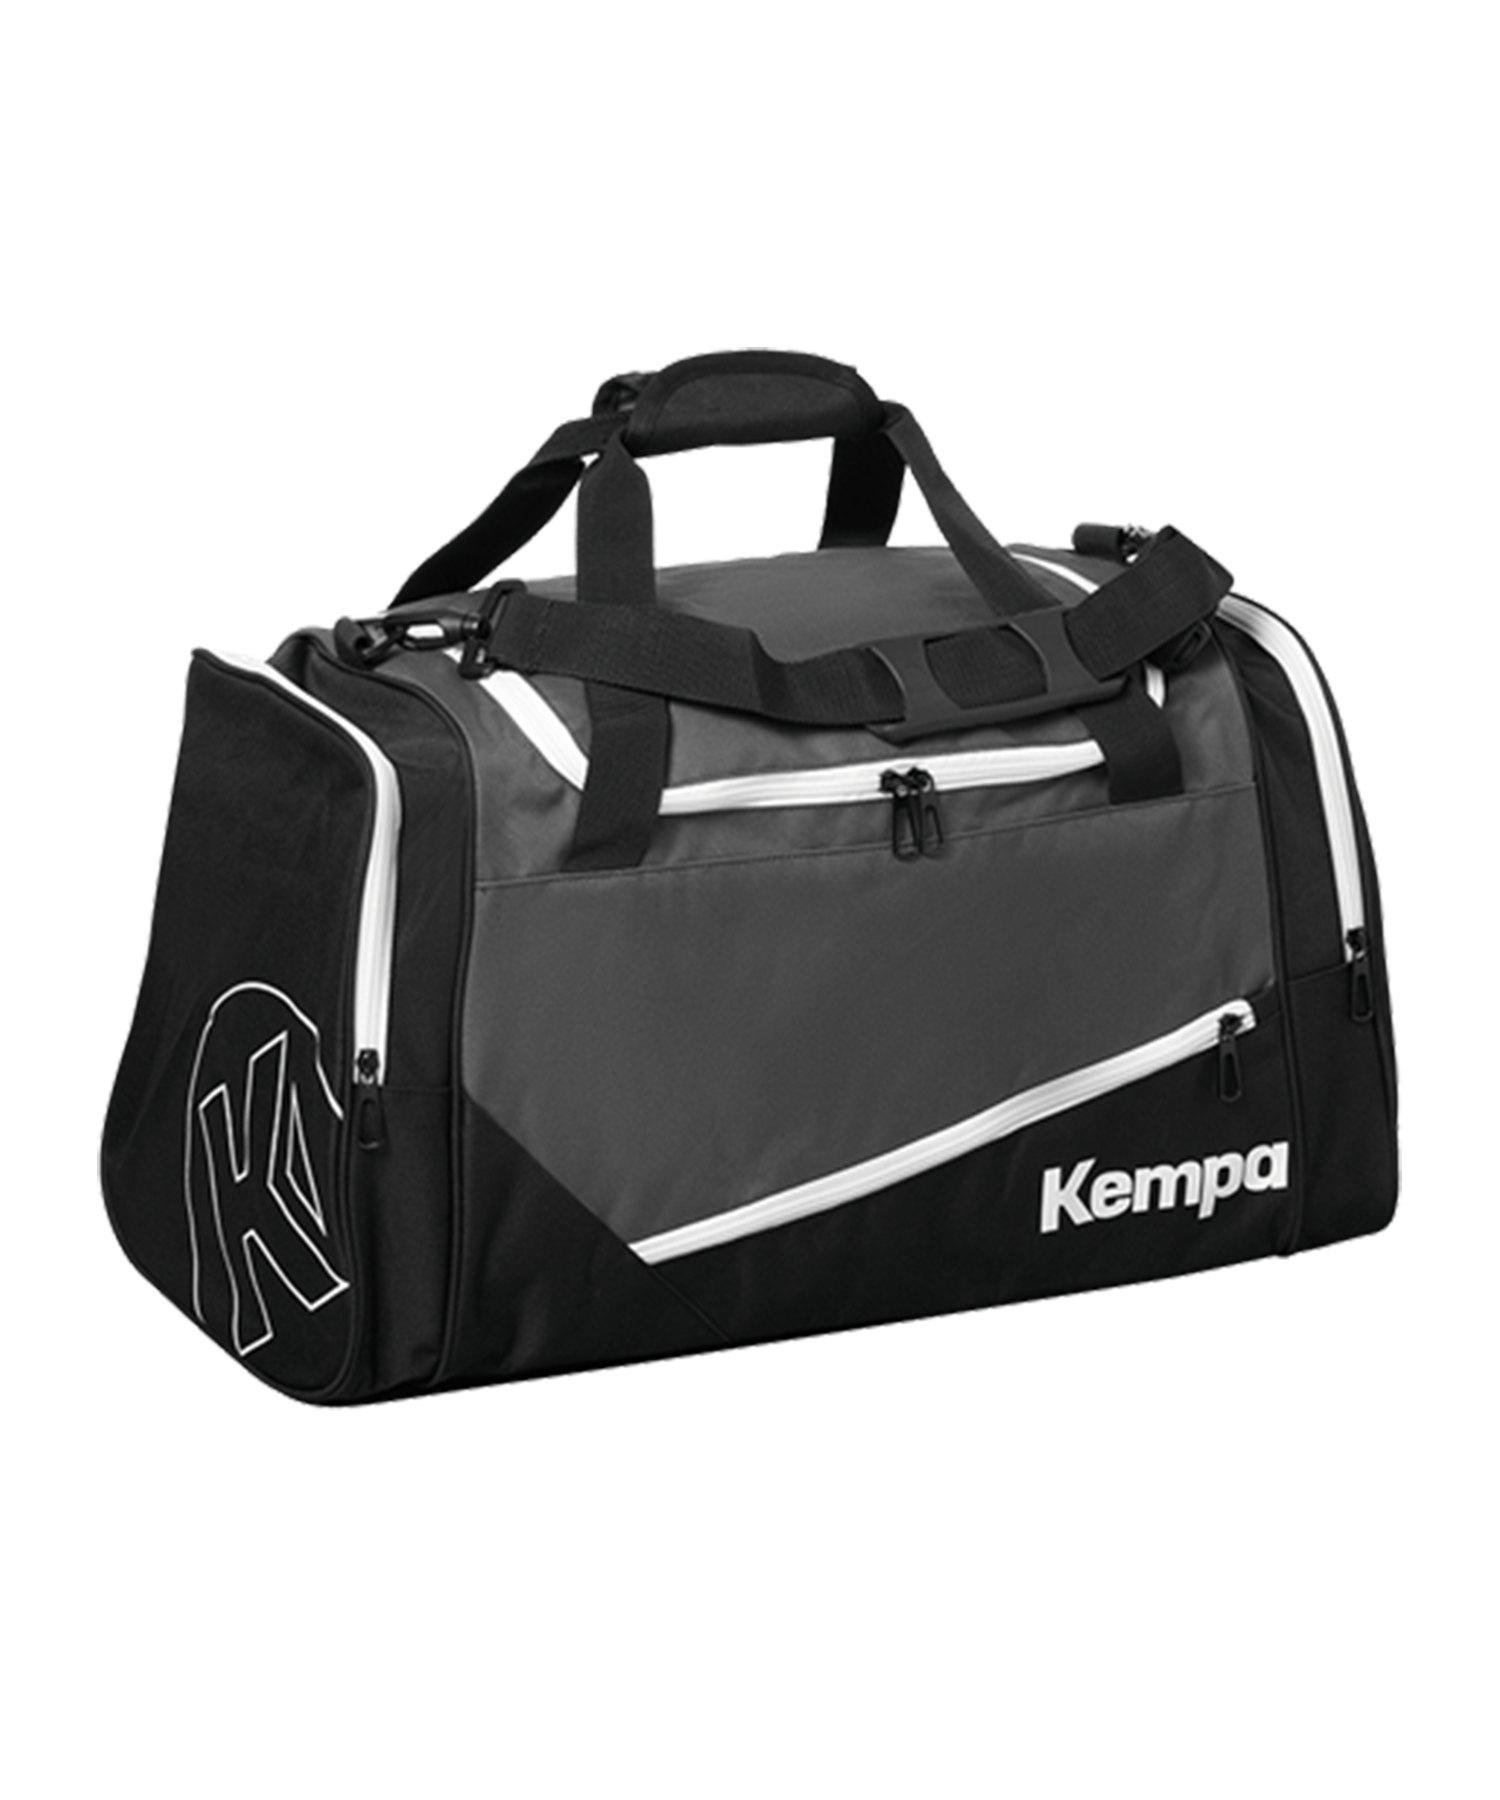 Kempa Sports Bag Sporttasche XL Schwarz F01 - schwarz